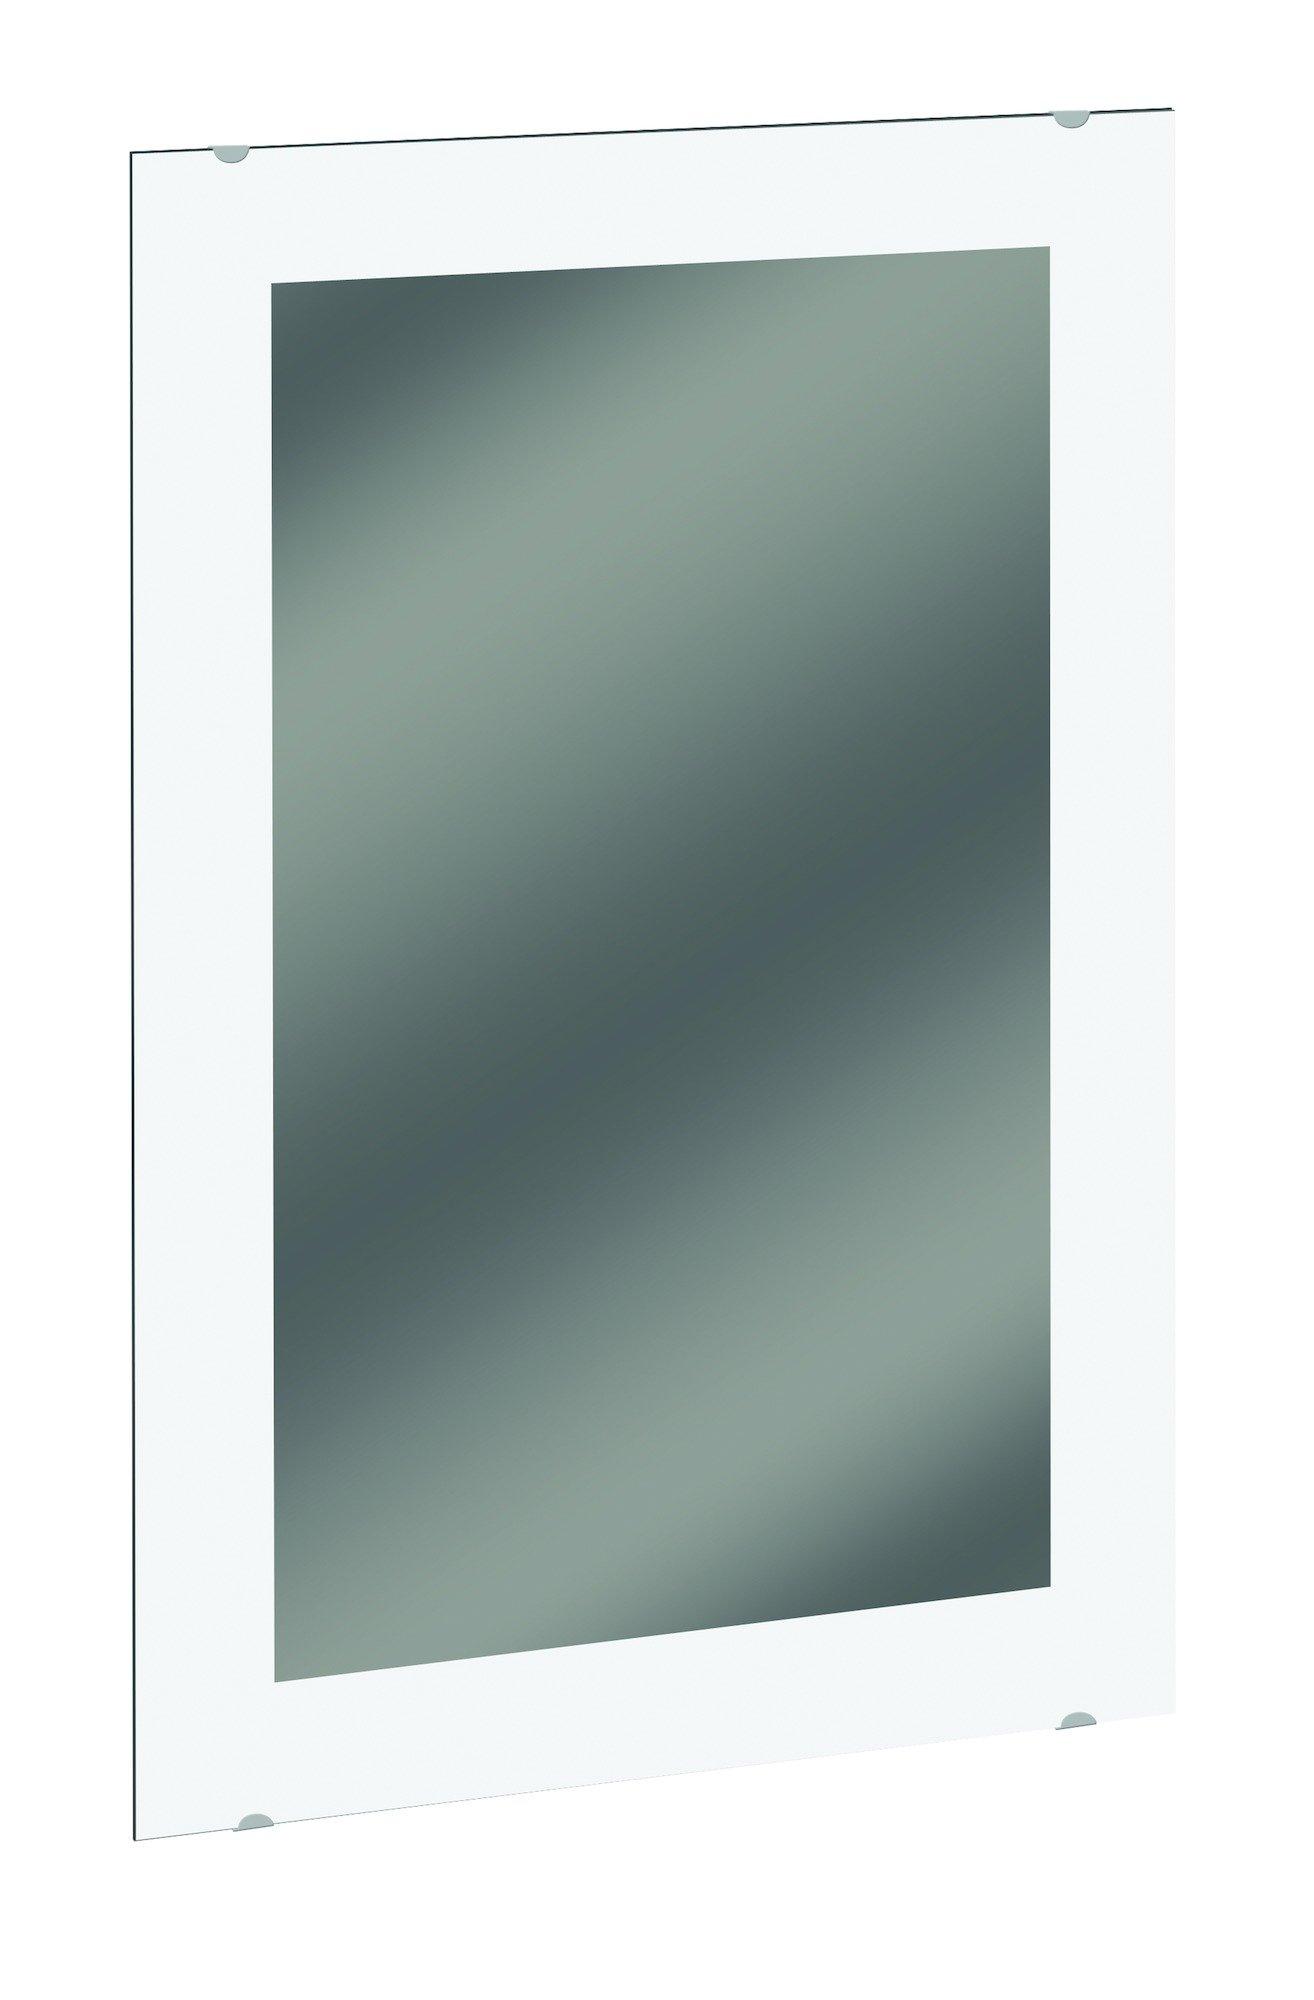 Frameless Mirror 24x36, 747F | Accurate Door & Hardware, Inc